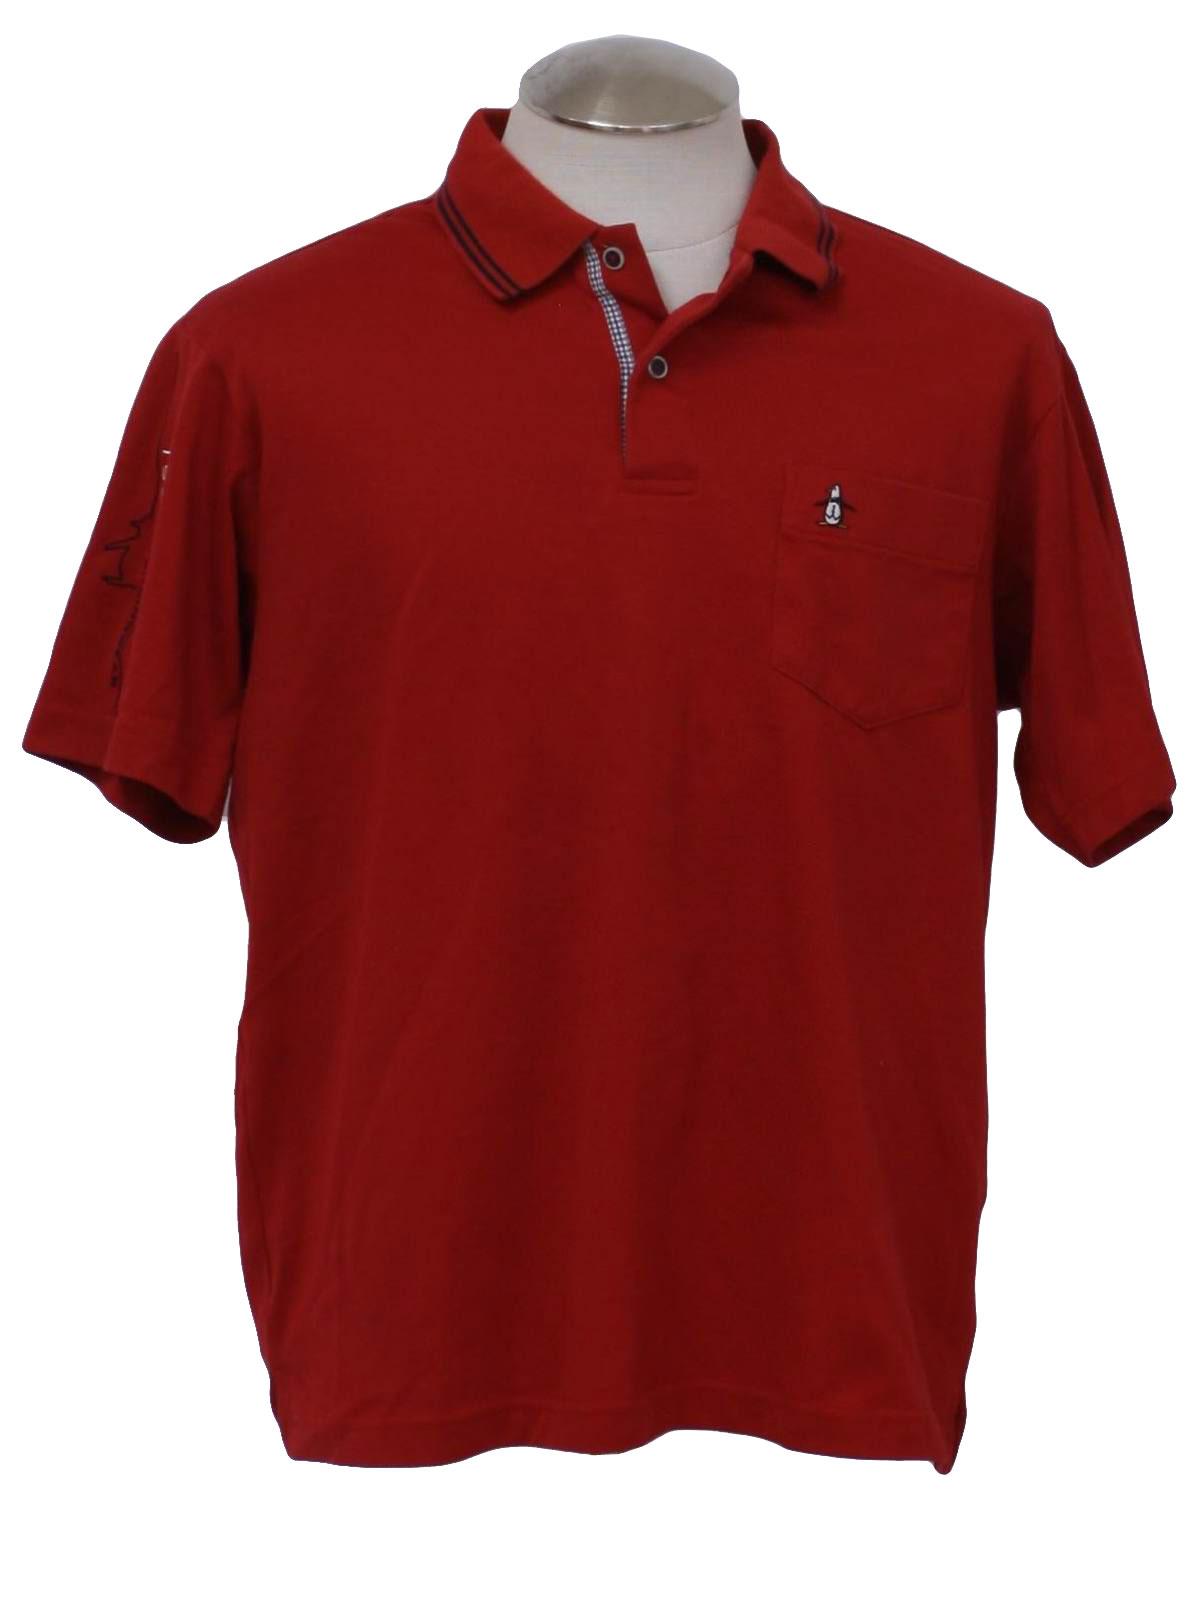 Munsingwear nineties vintage shirt 90s munsingwear mens for Golf shirt with penguin logo